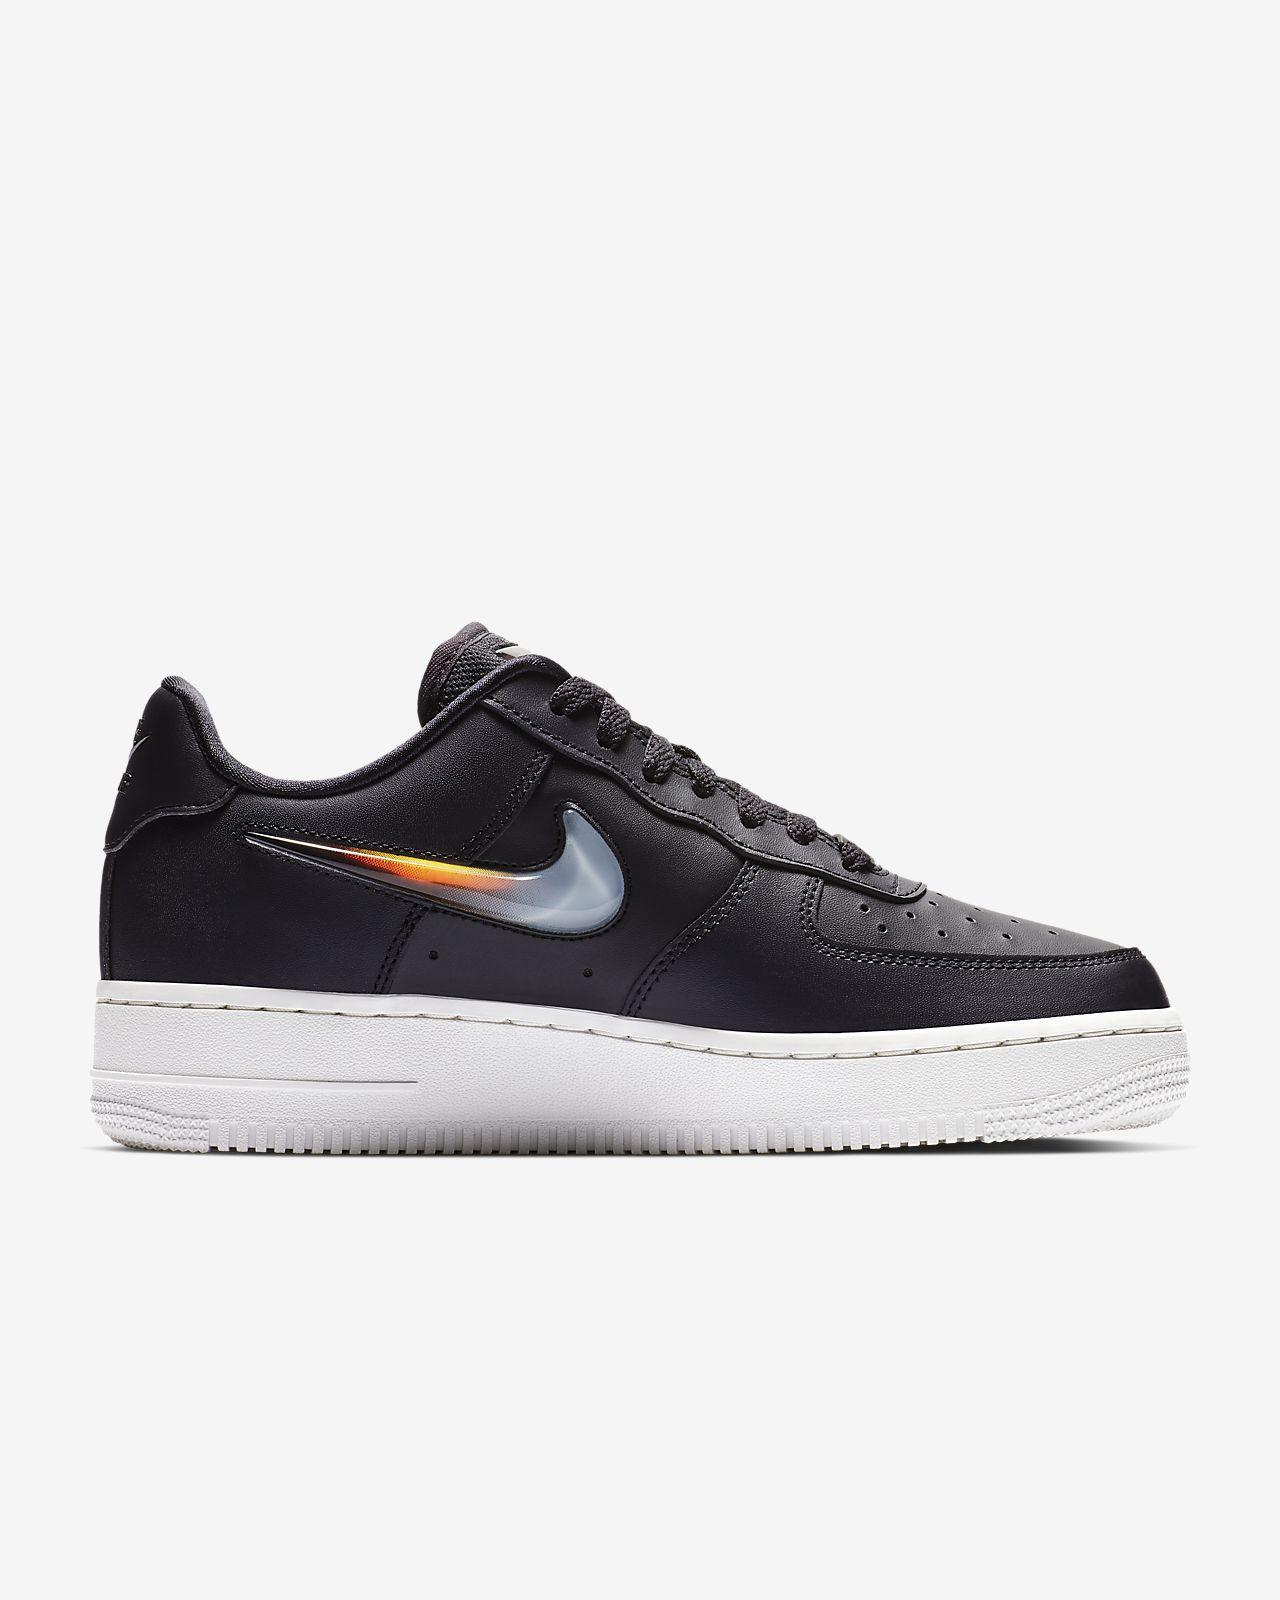 separation shoes 2f772 f4683 ... Sko Nike Air Force 1  07 SE Premium för kvinnor